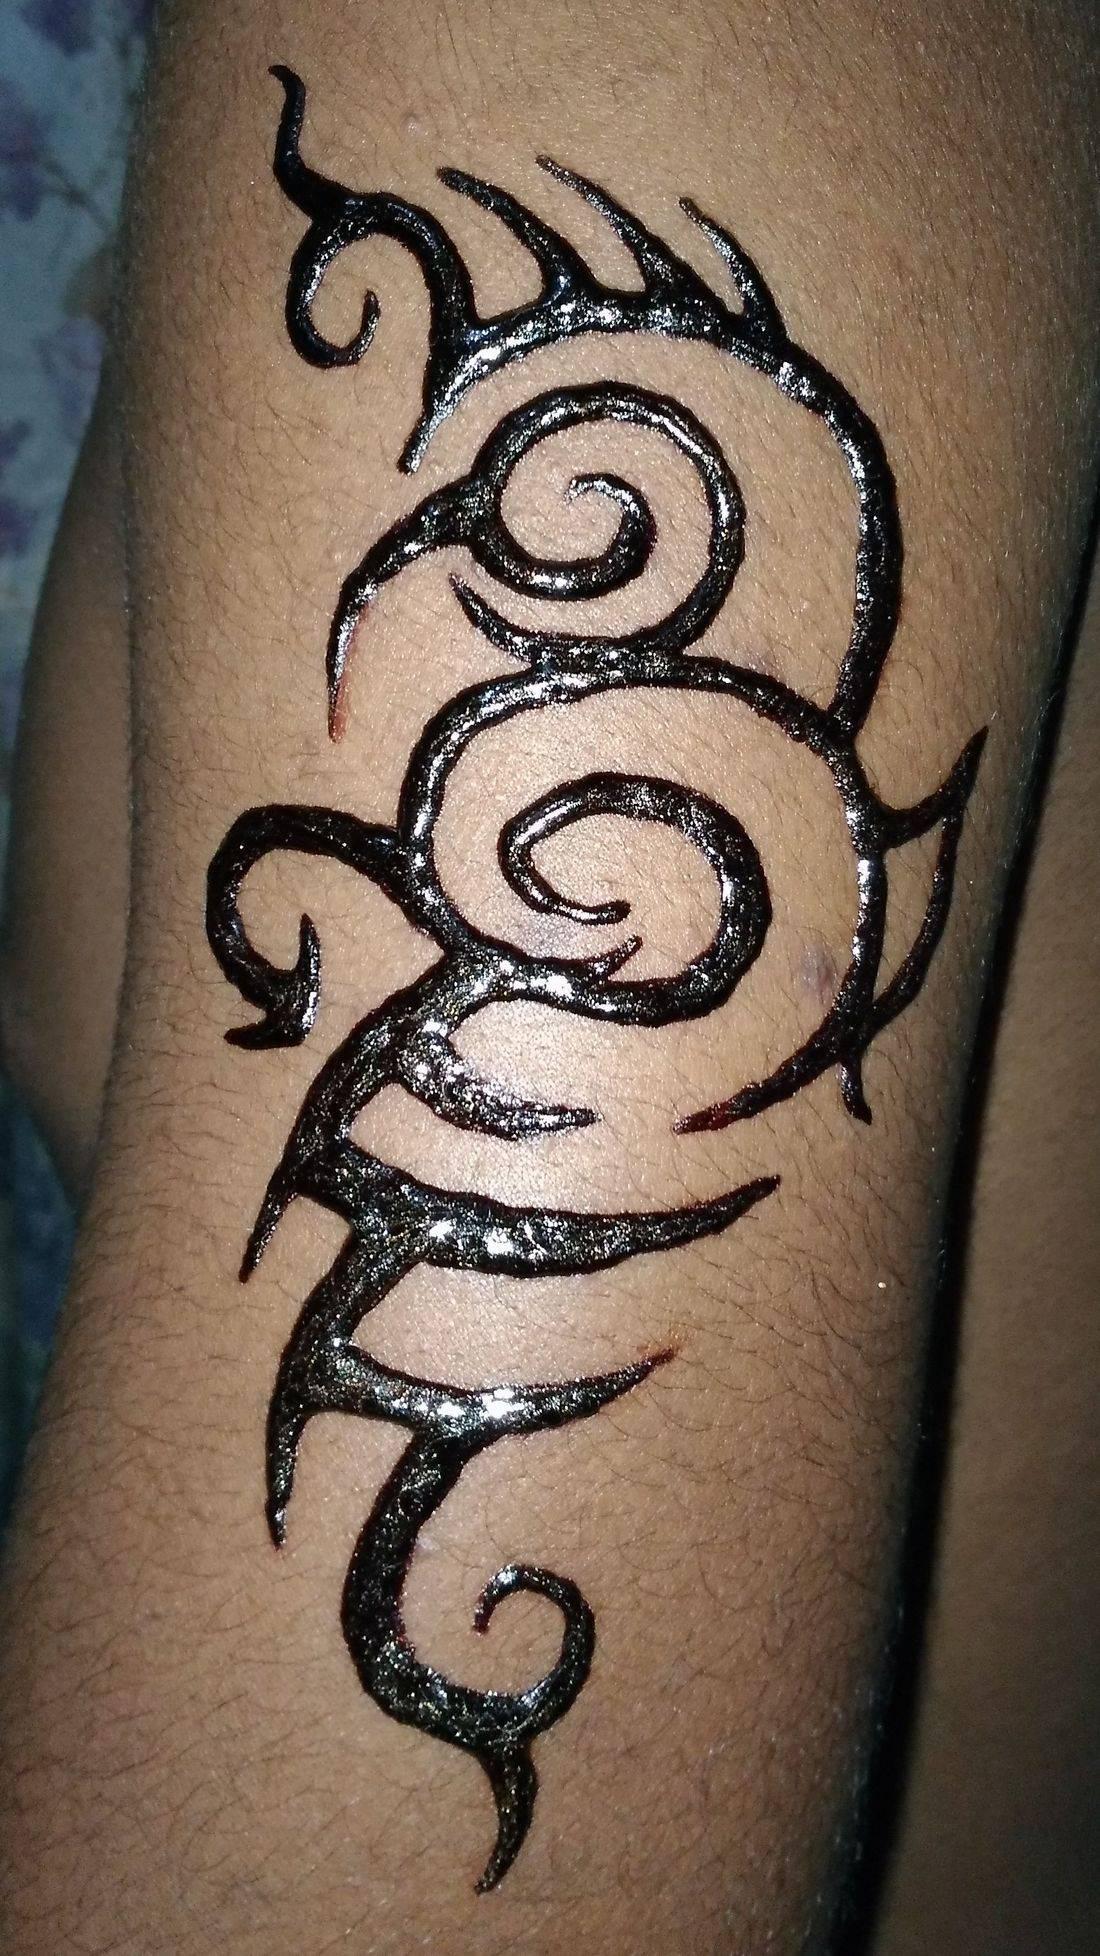 Tribal Henna, Tribal, Henna, JaHenna, Henna in Jamaica, Henna in Negril, Henna By Candice Peart